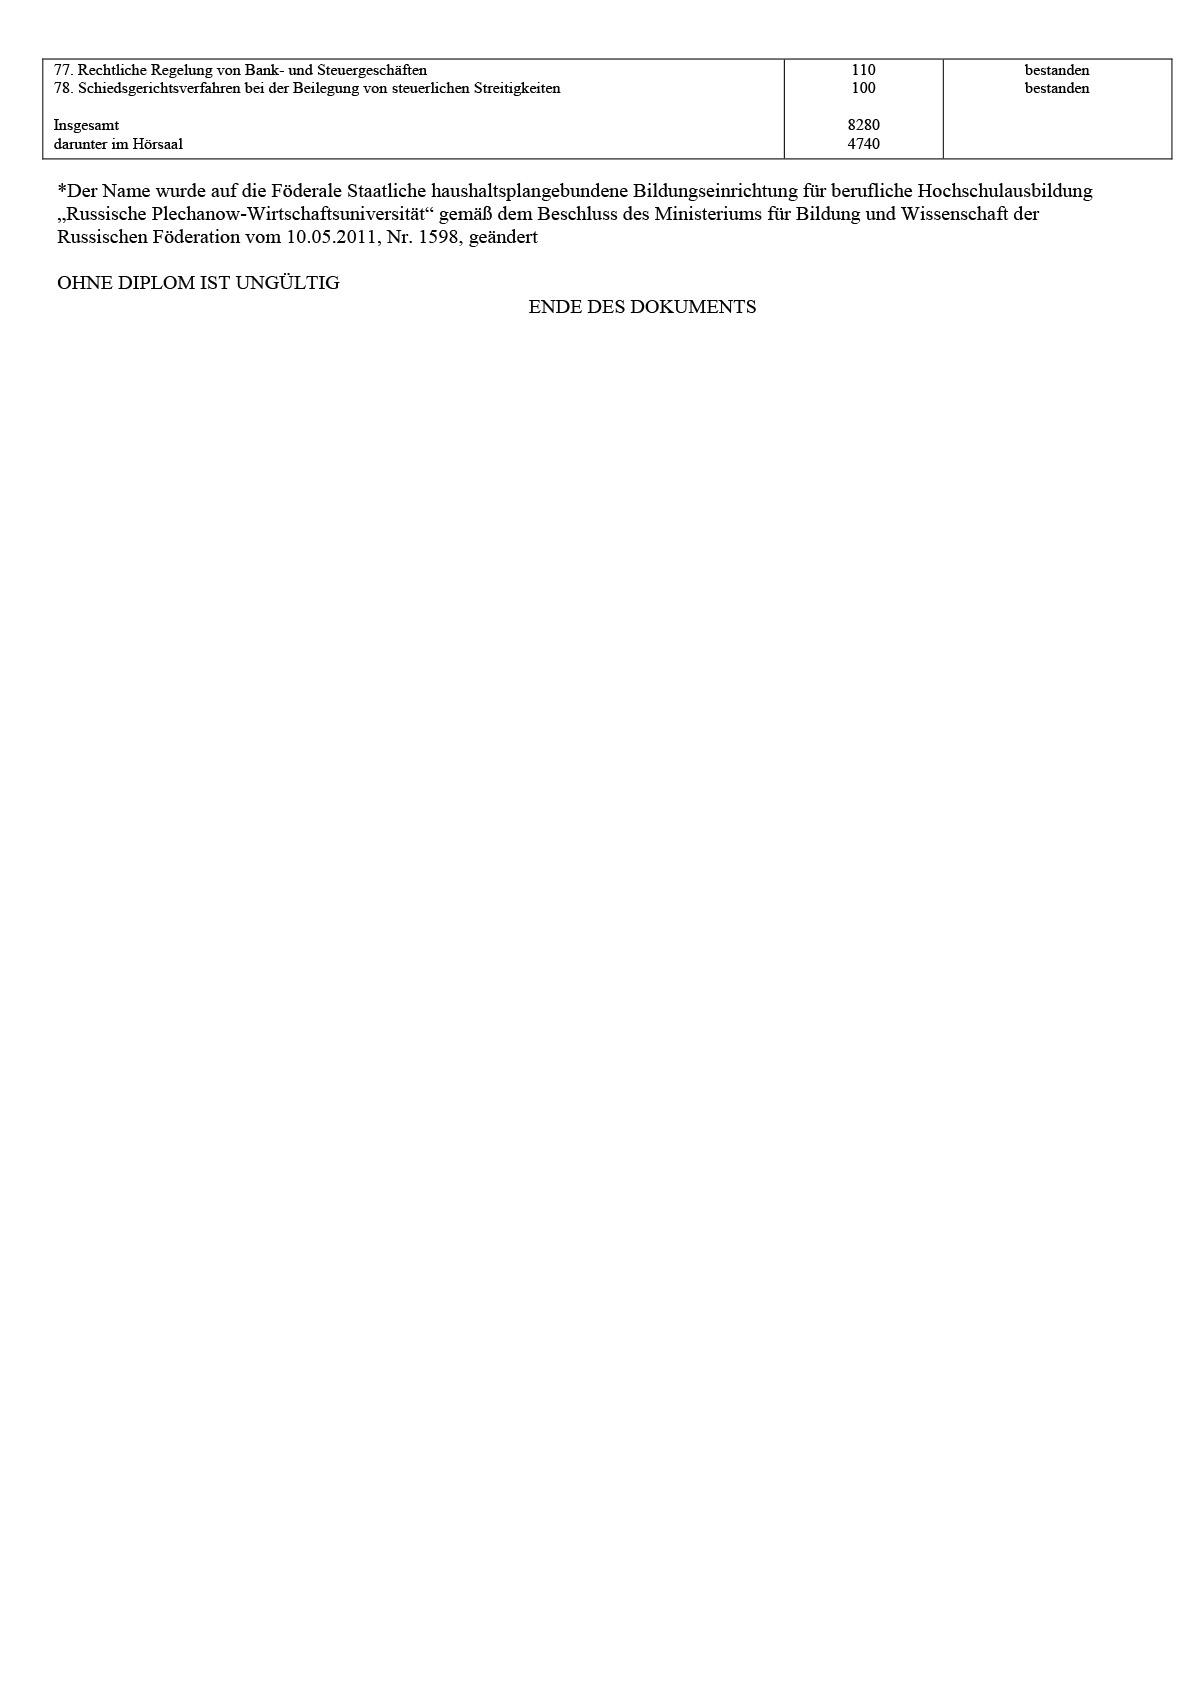 Перевод диплома на немецкий